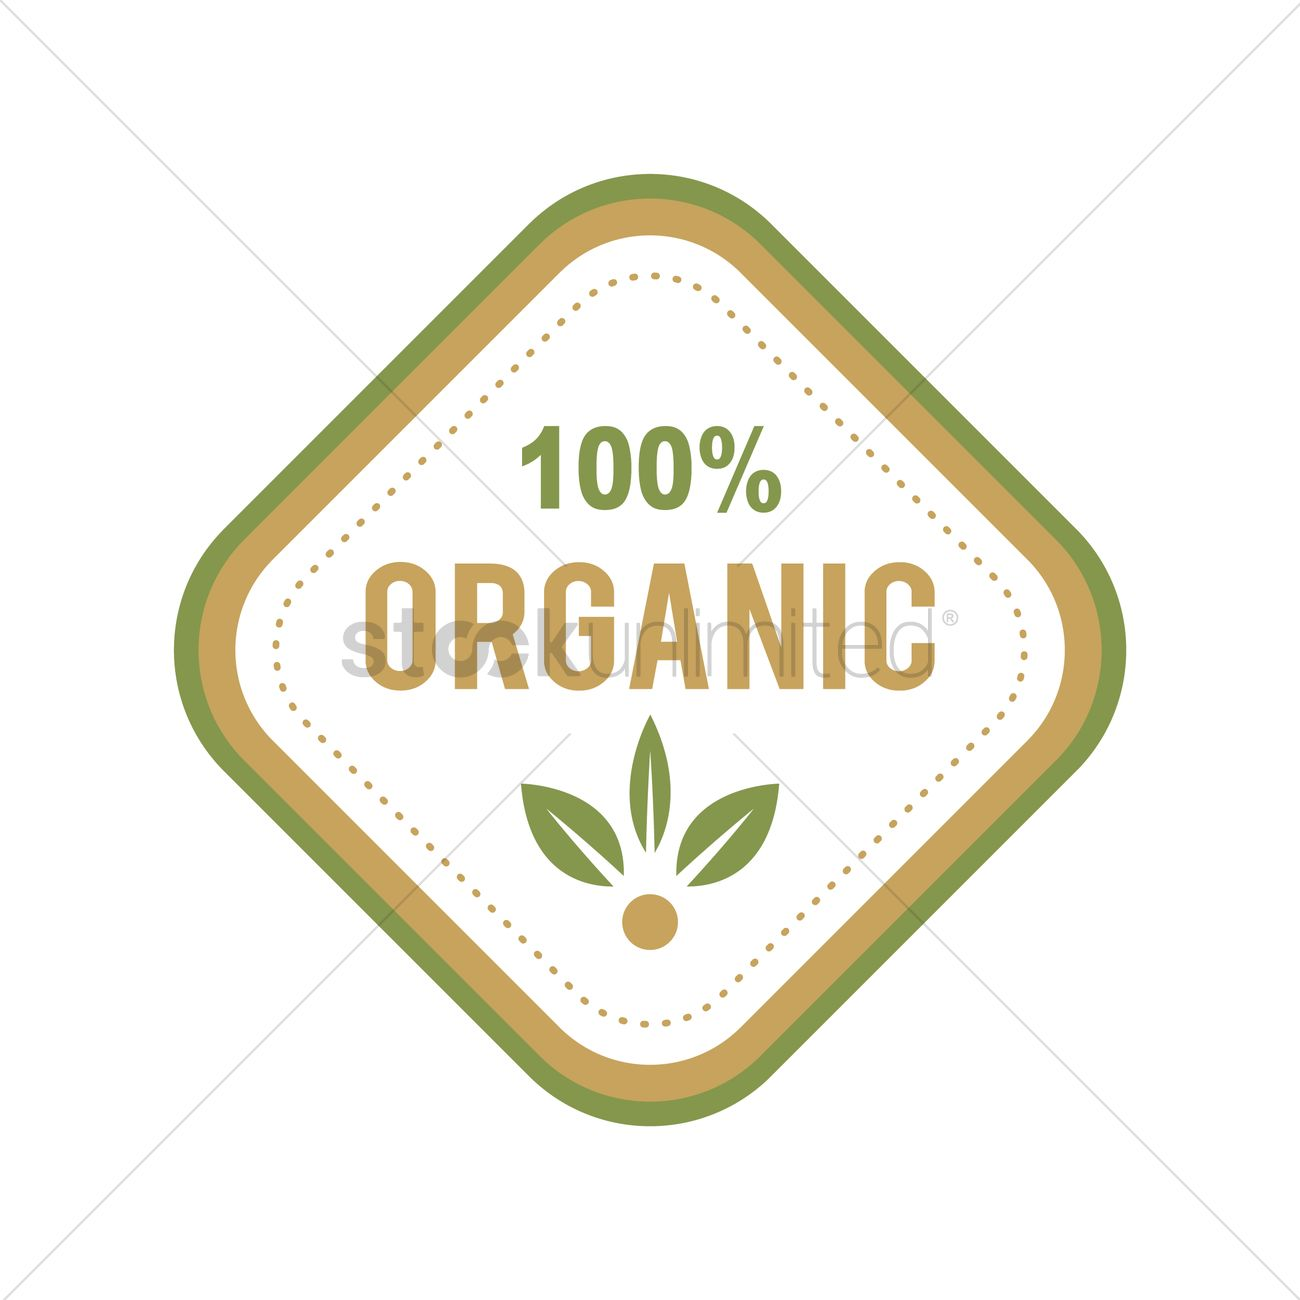 Organic food label design Vector Image - 2029876 | StockUnlimited